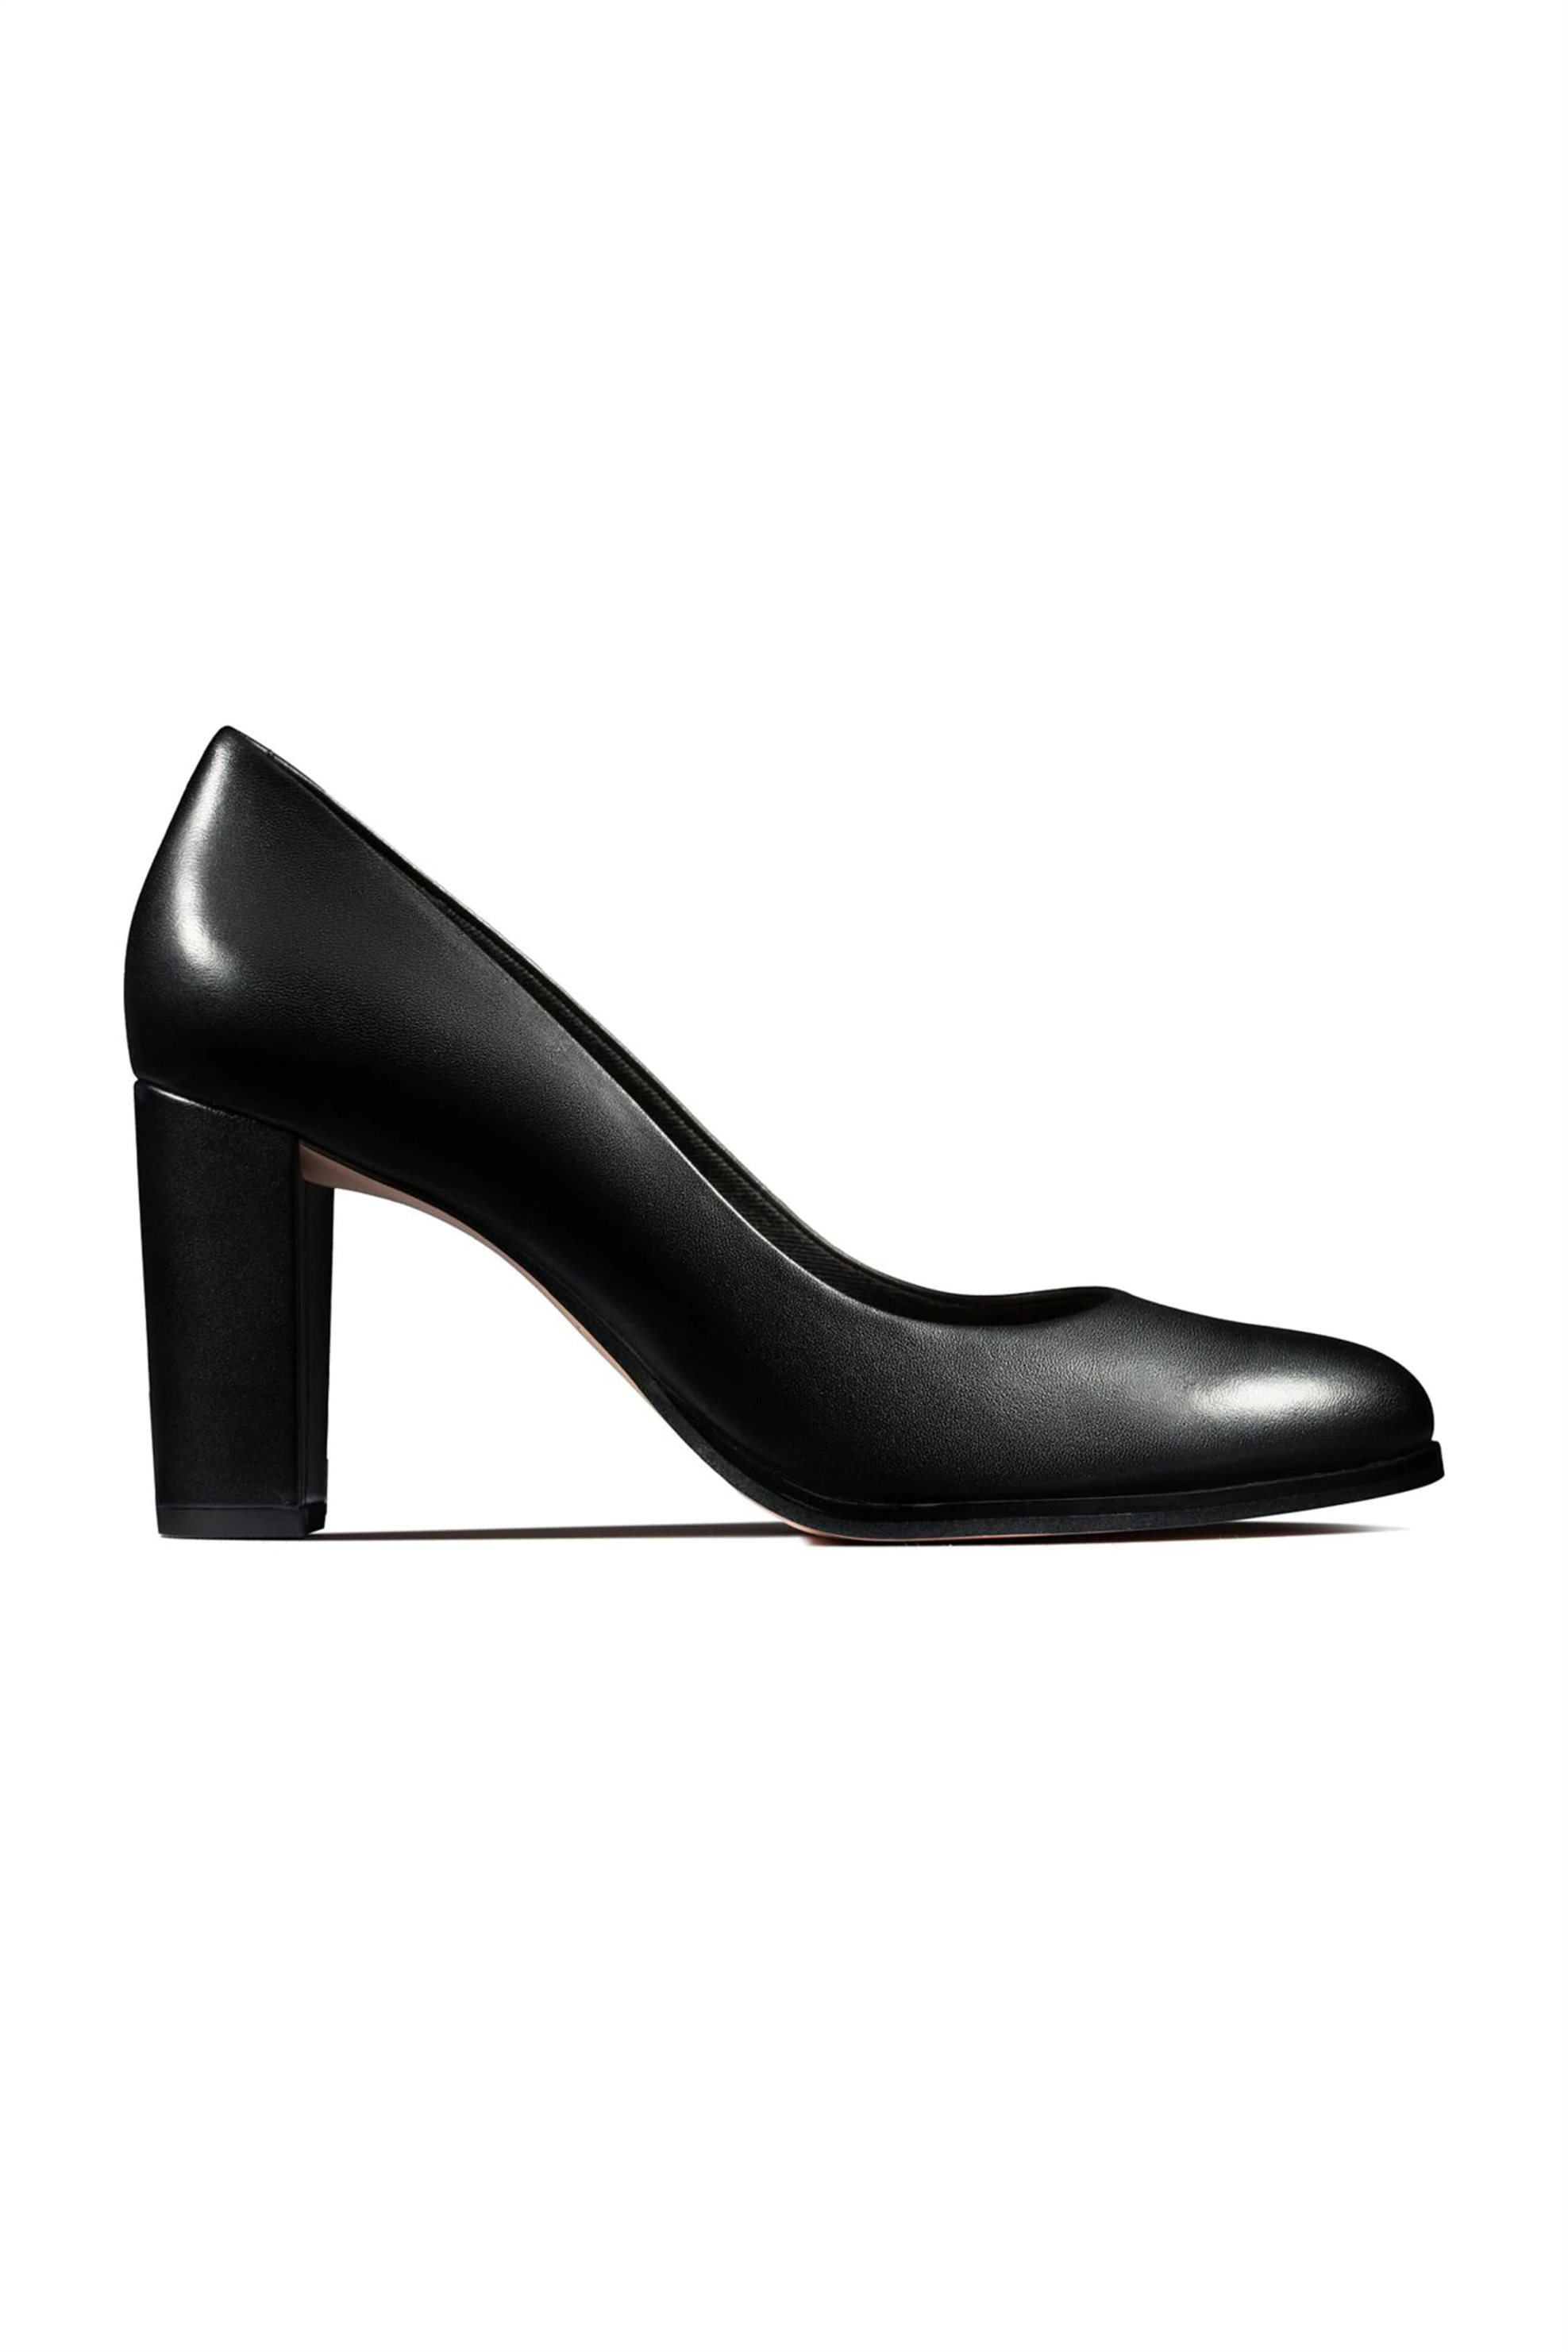 Clarks γυναικείες δερμάτινες γόβες «Kaylin Cara» – 26145688 – Μαύρο